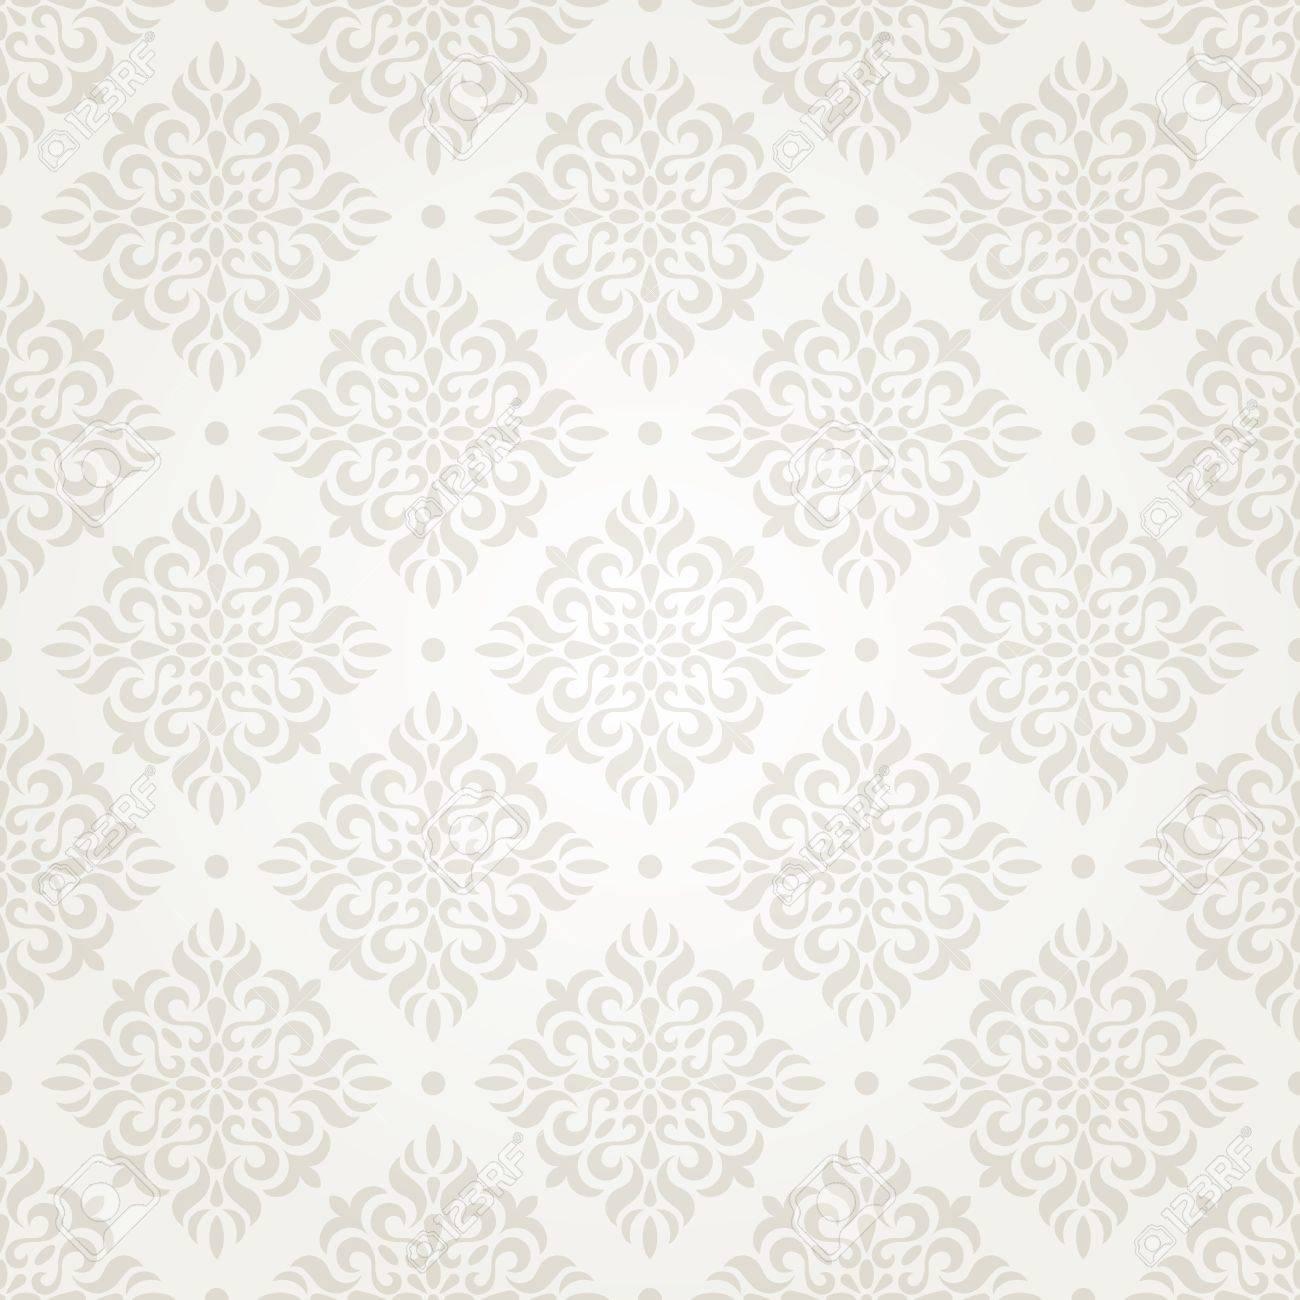 Silver vintage seamless wallpaper Stock Photo - 13860009